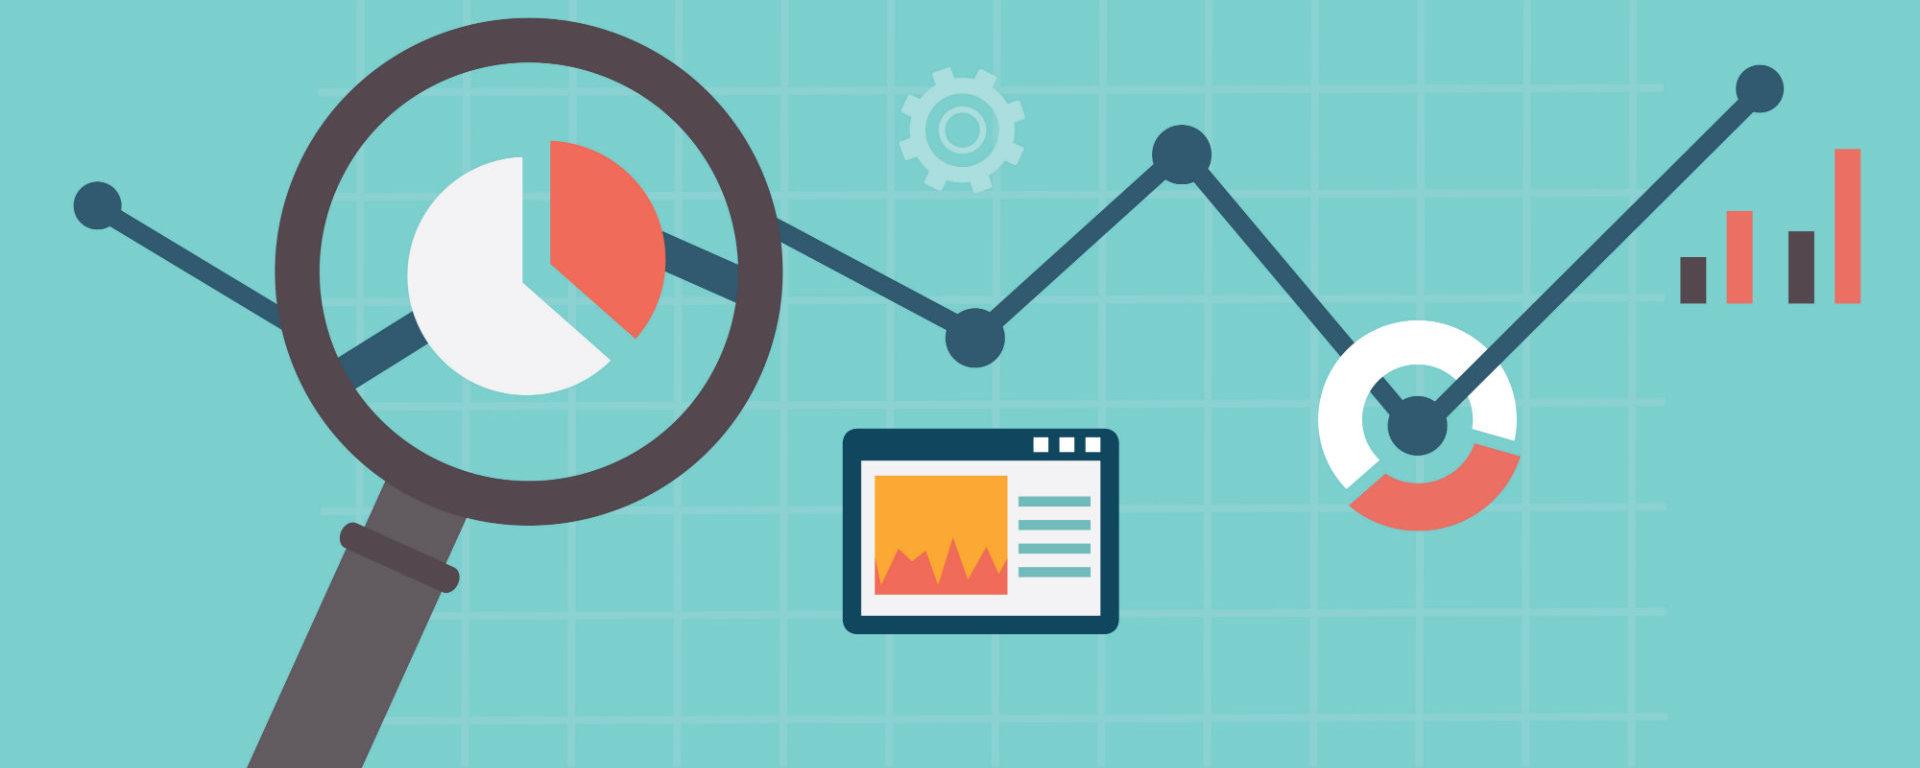 Intro to Data Analytics with Python